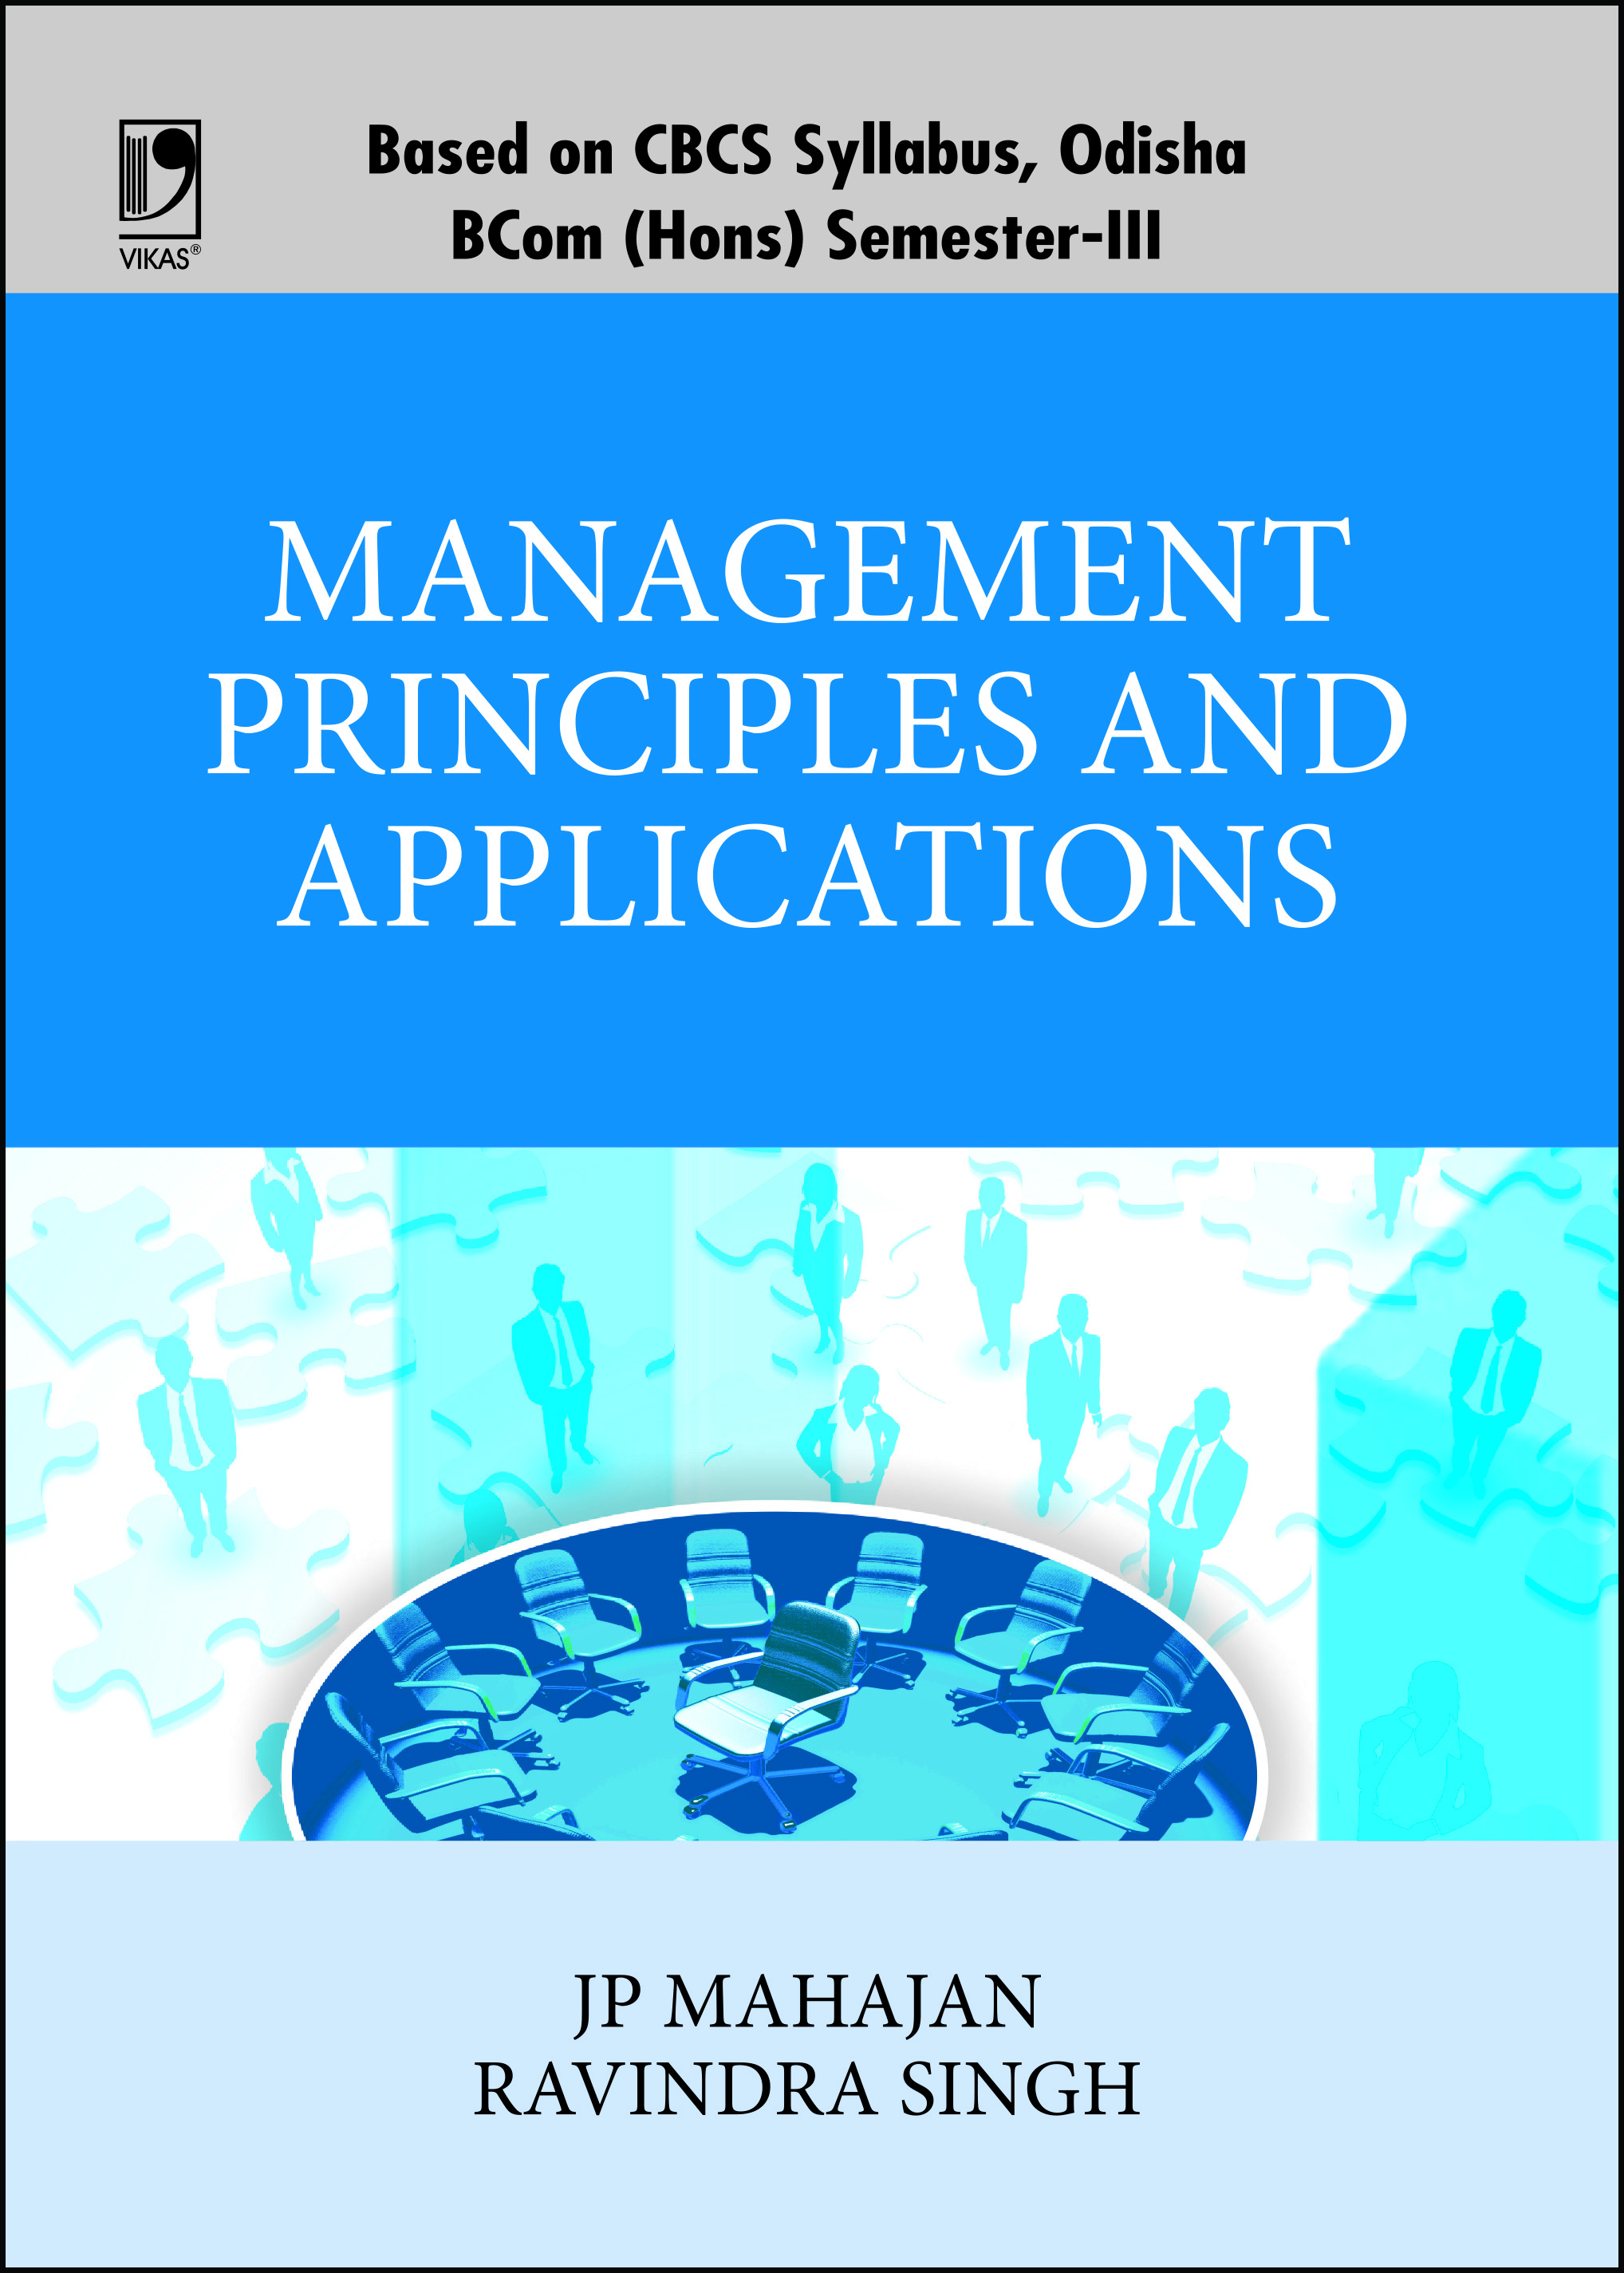 Management Principles and Applications (For B.Com. (Hons.) 3rd Semester, Odisha Universities)